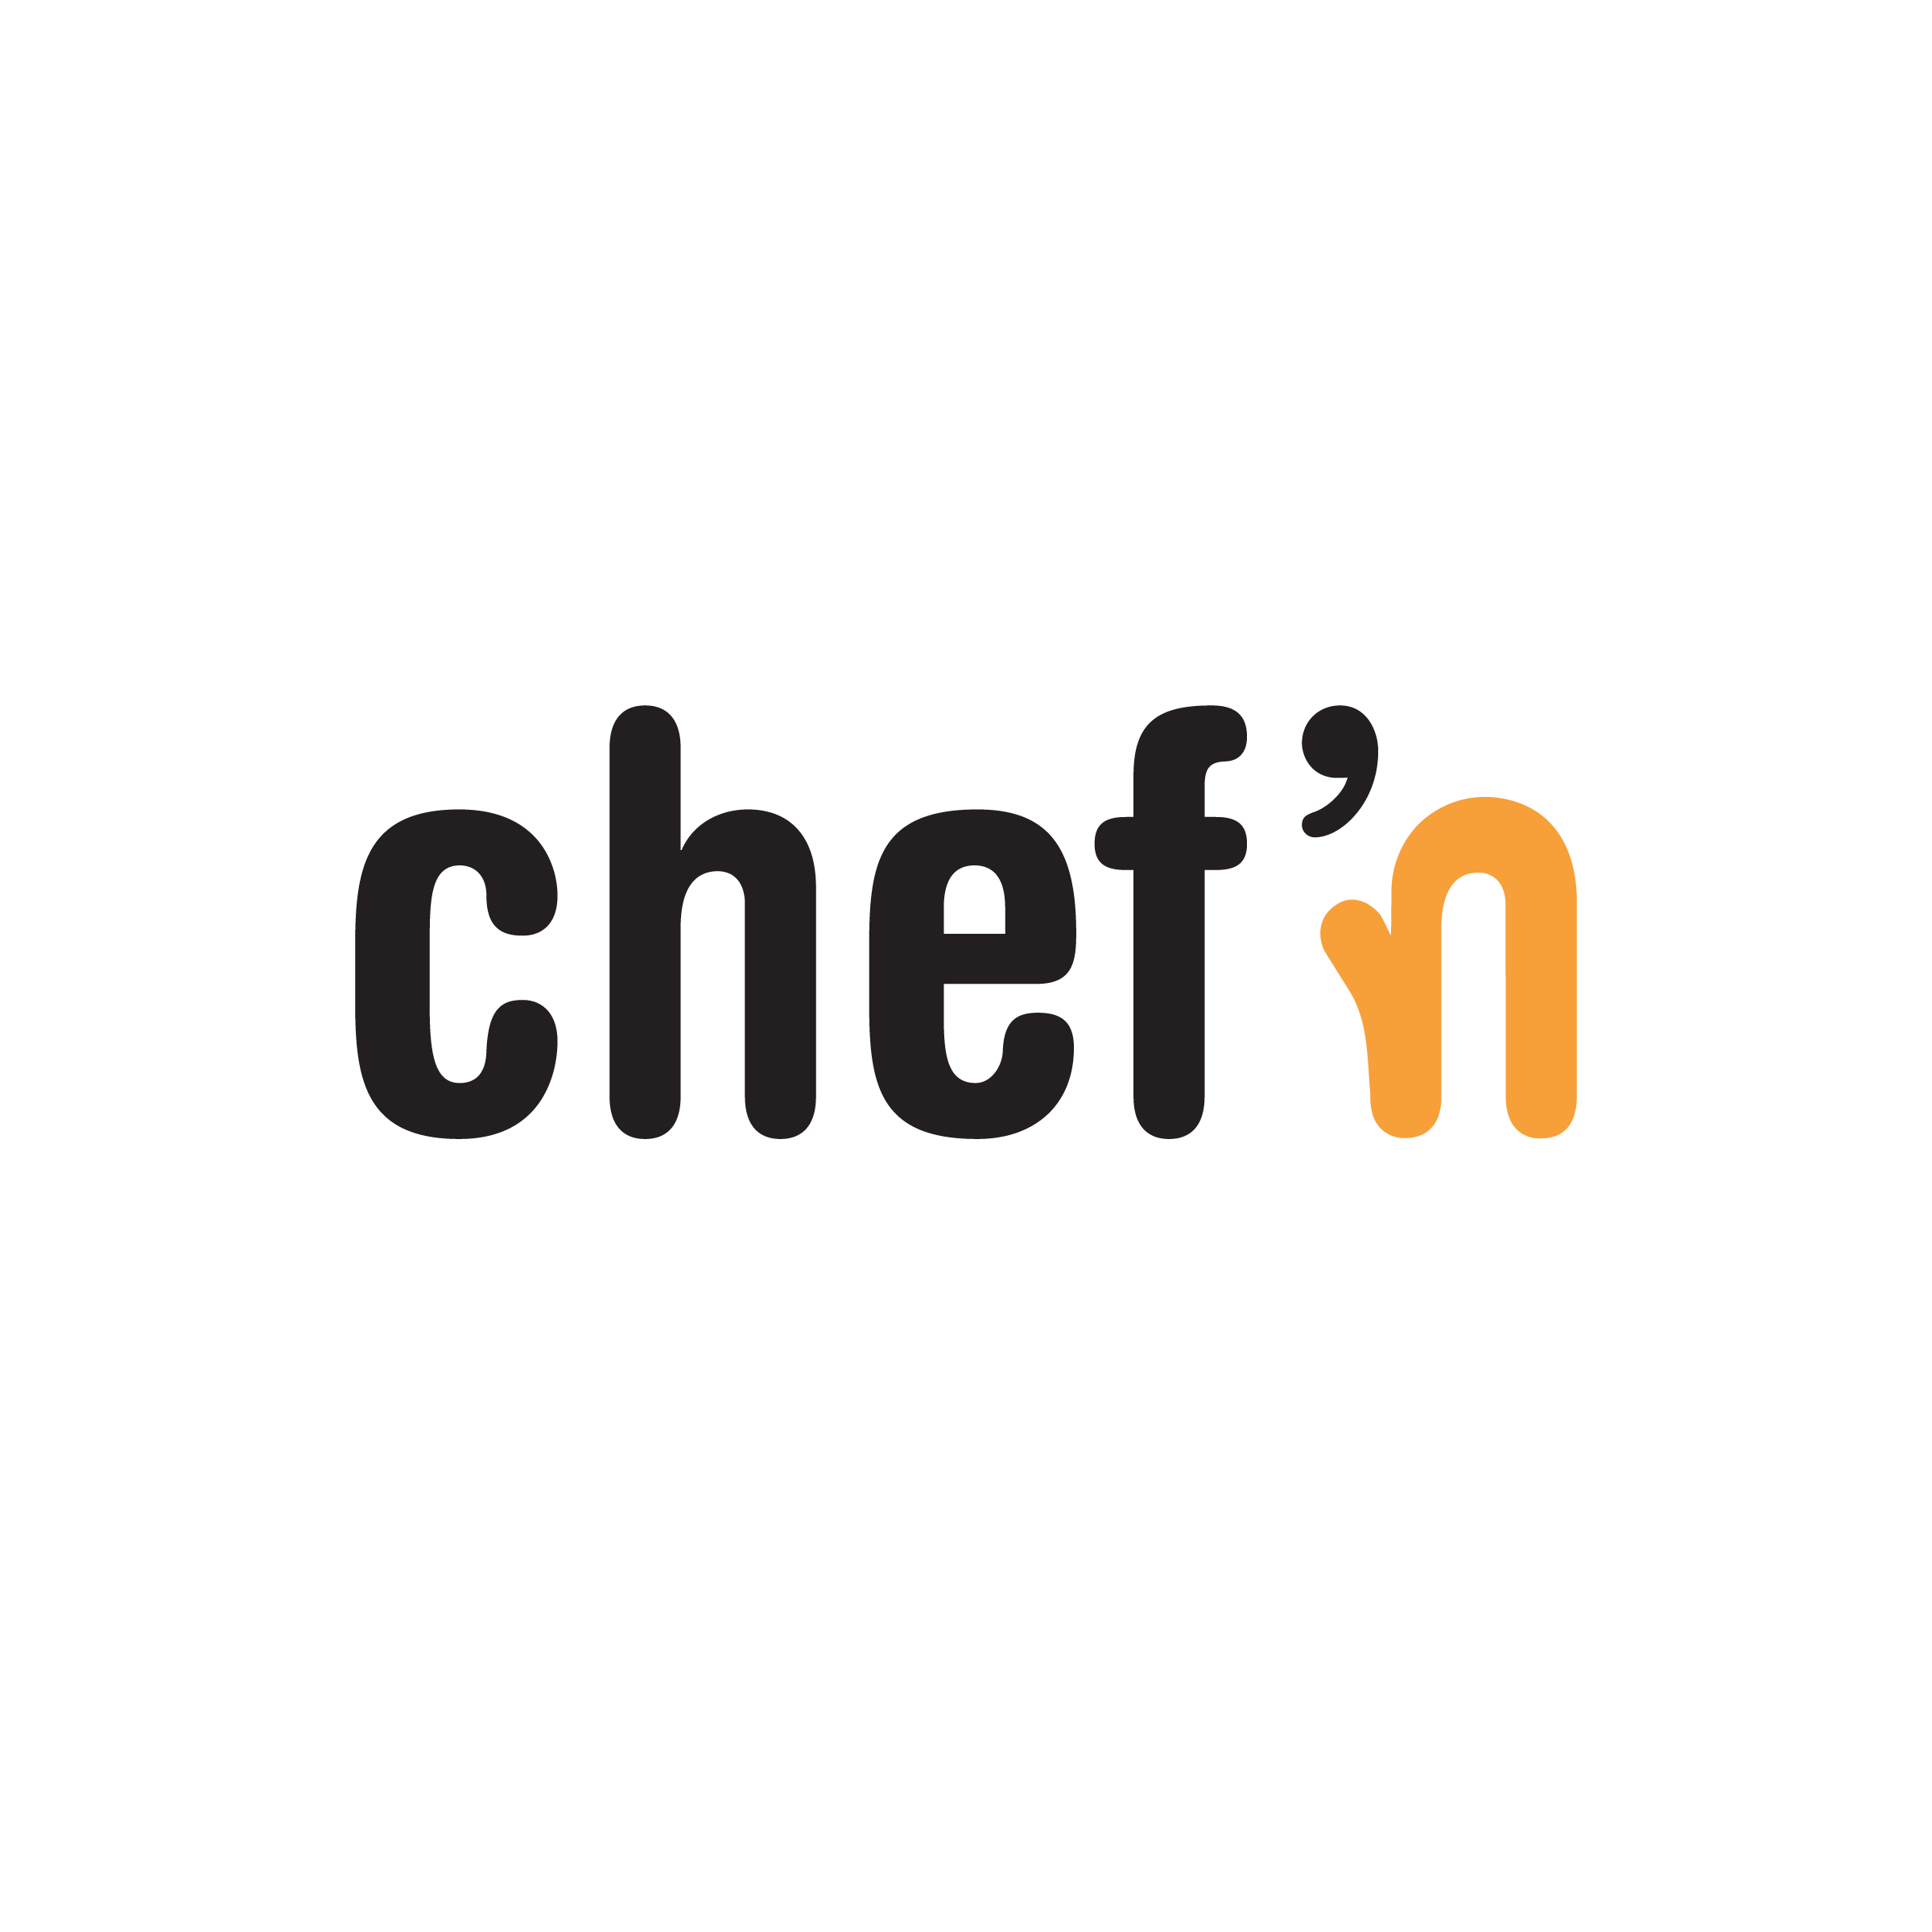 Final logo Solution